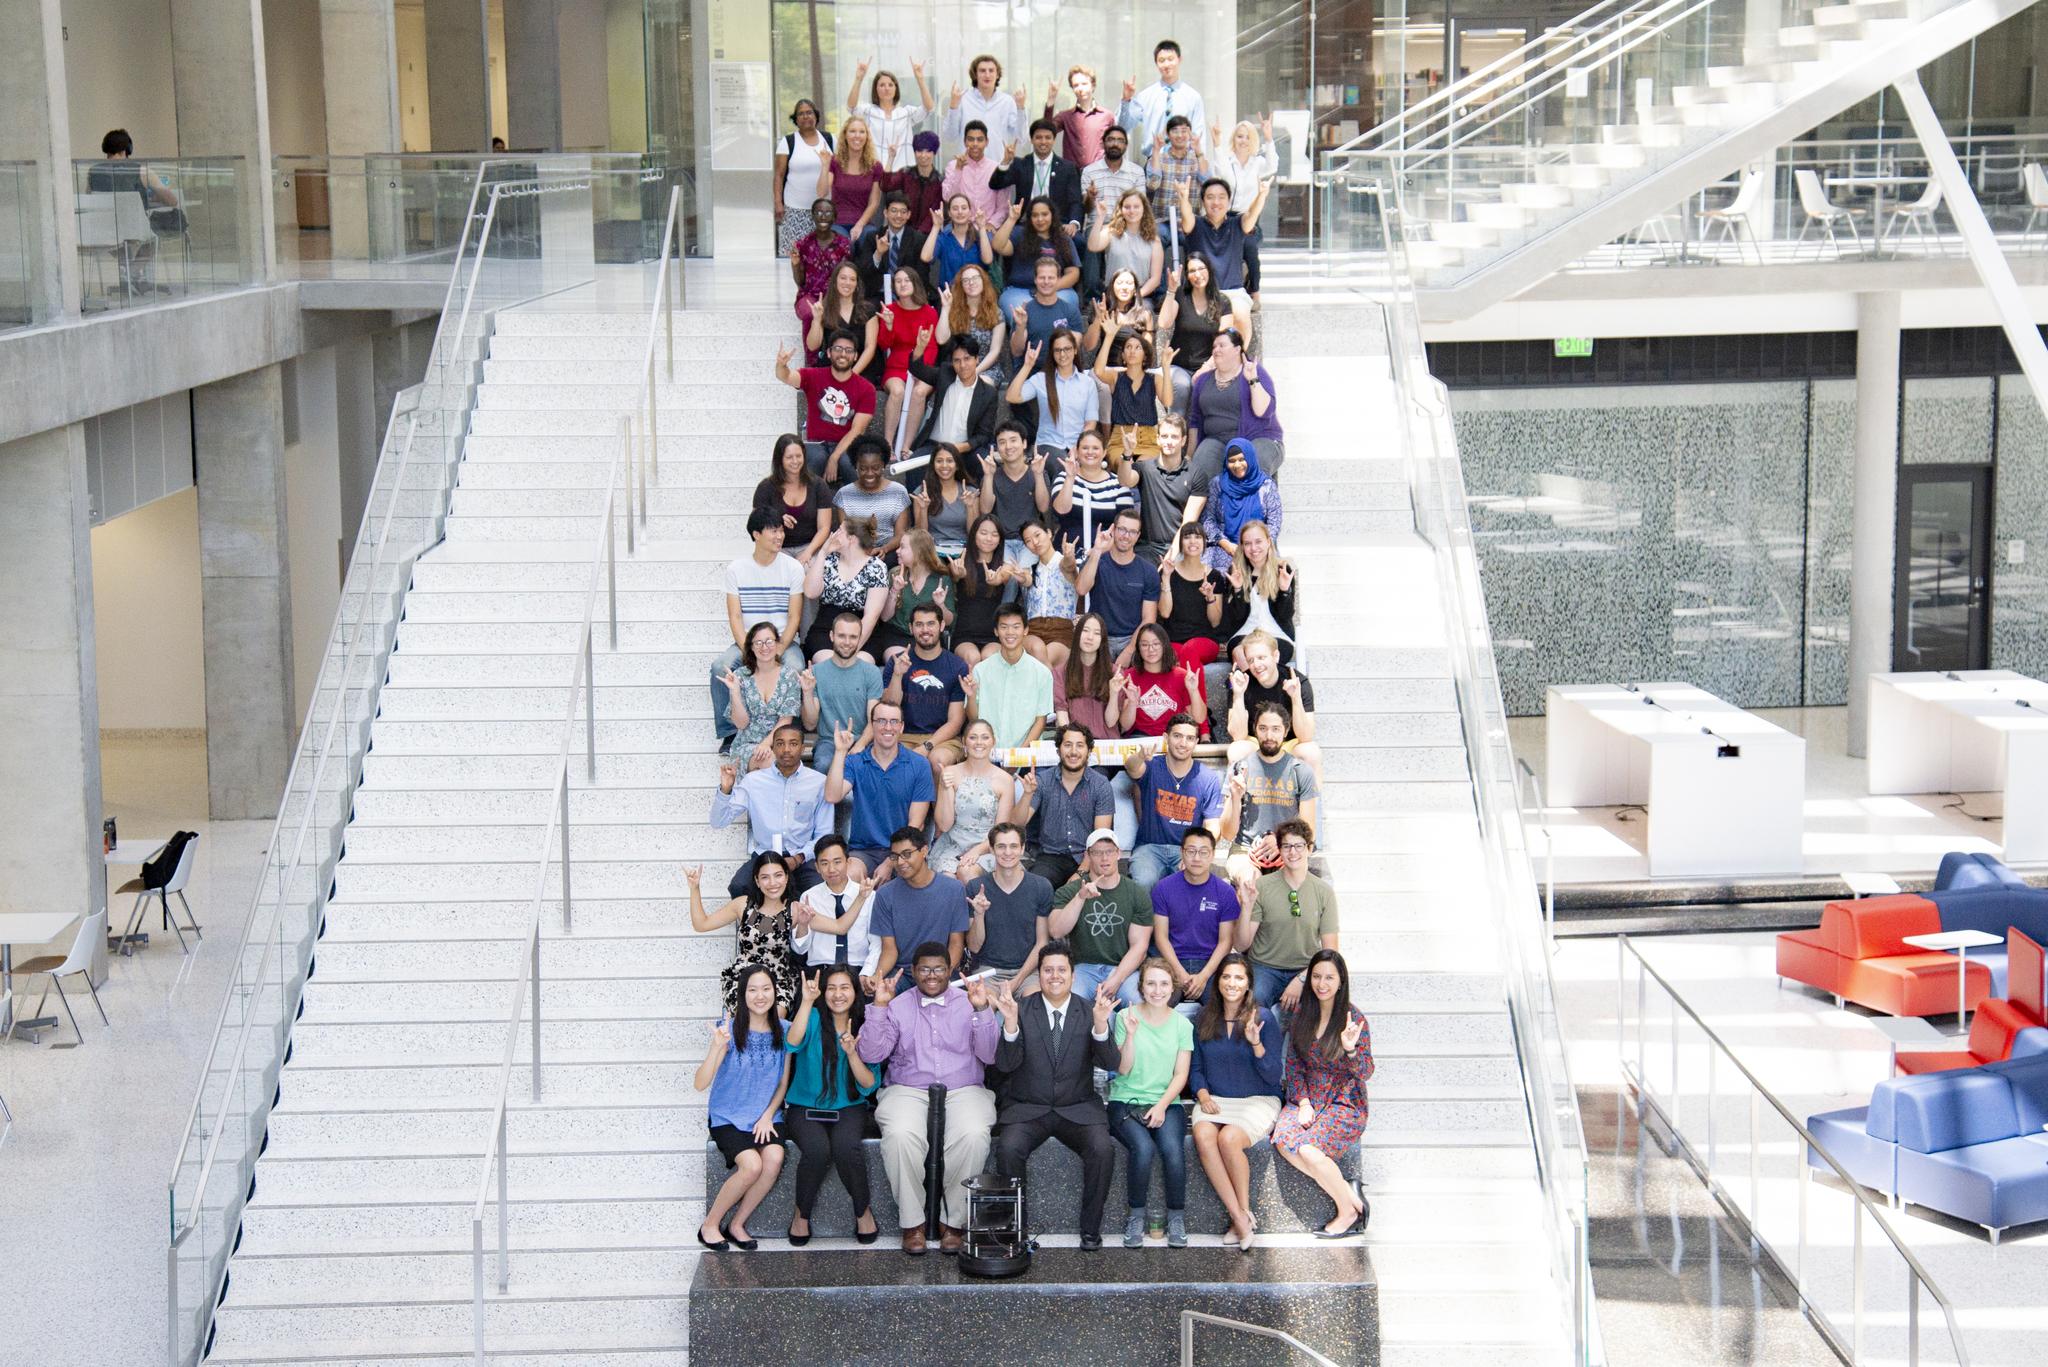 Past REU and RET participants pose in the ECE atrium.